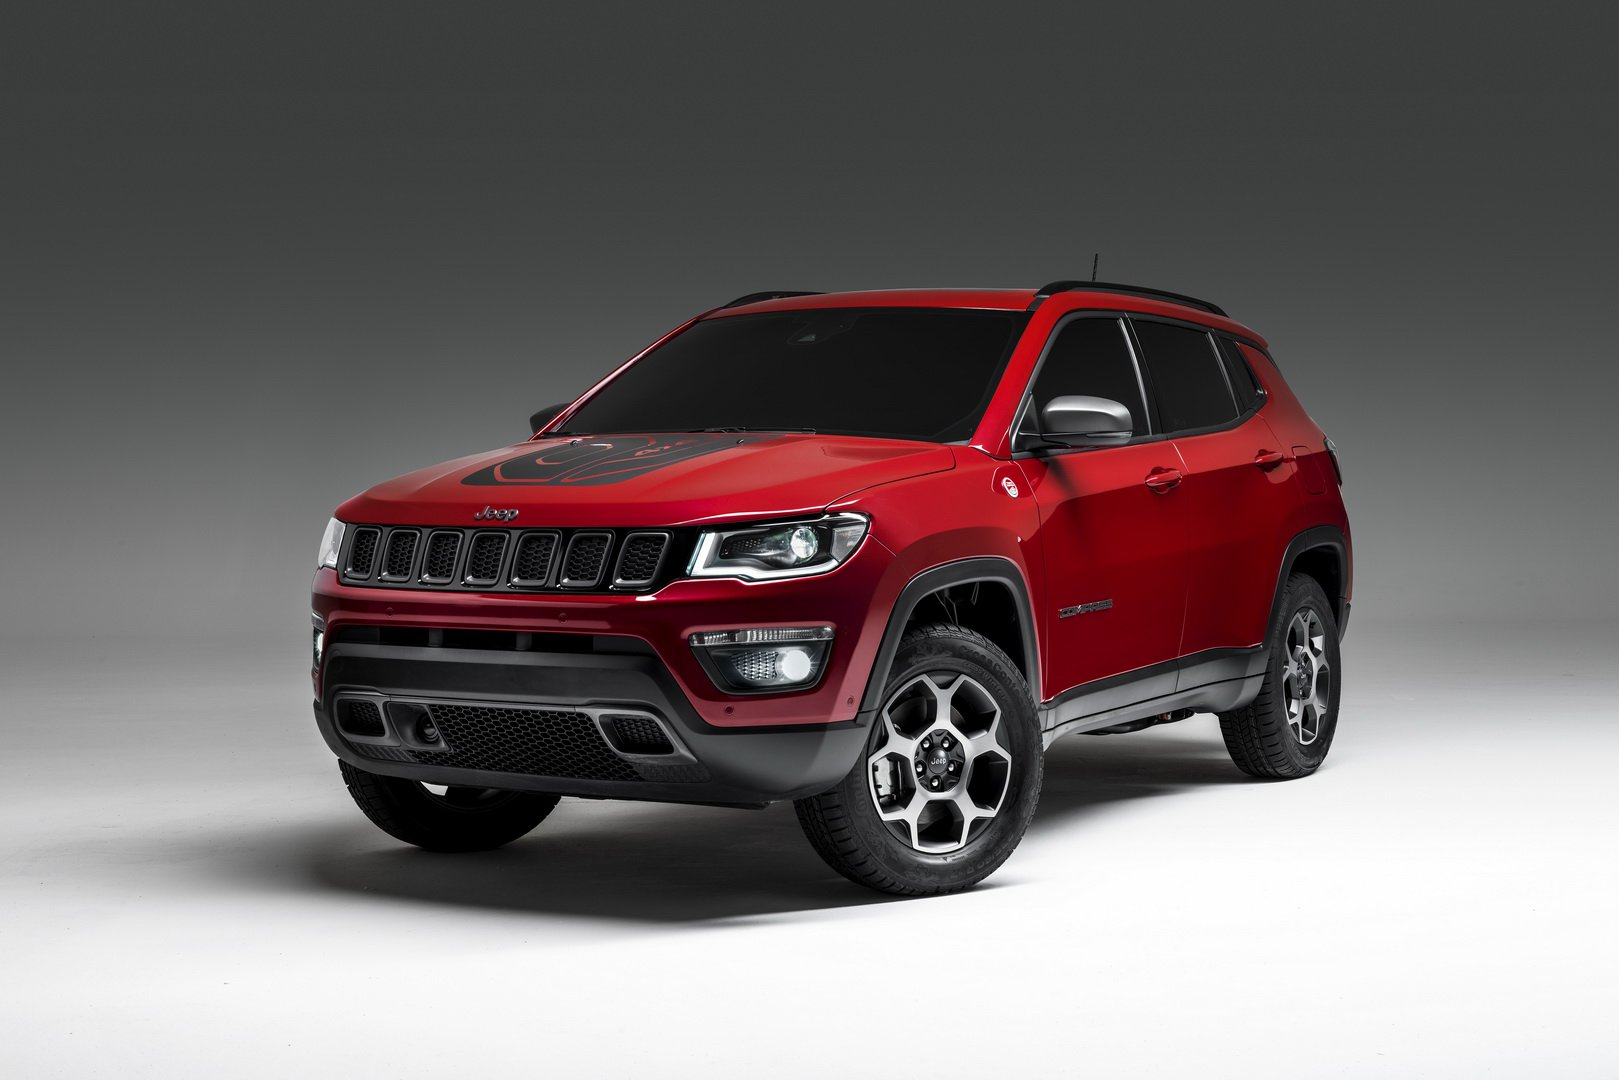 Jeep Renegade e Compass PHEV ibride plugin foto ufficiali - Salone di Ginevra 2019